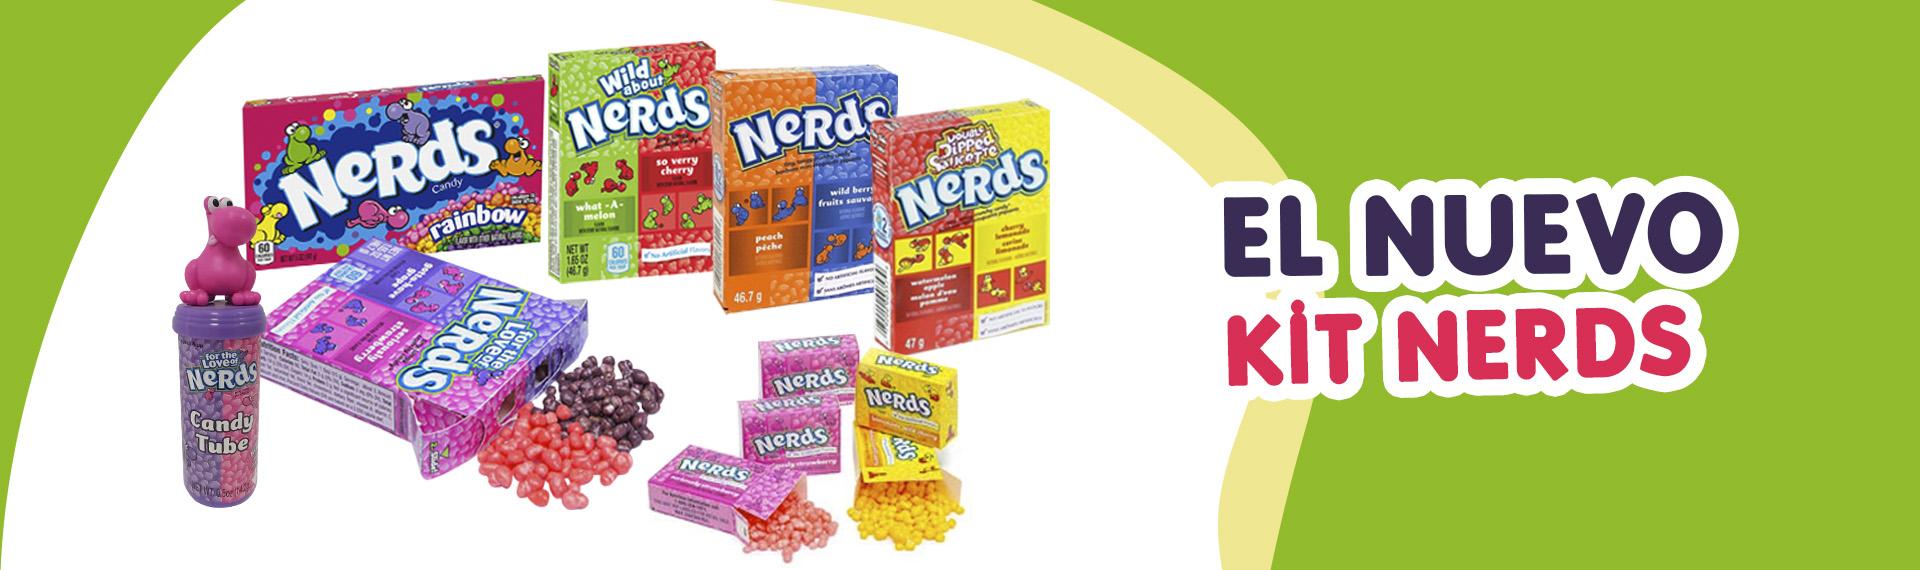 banner nuevo kit nerds